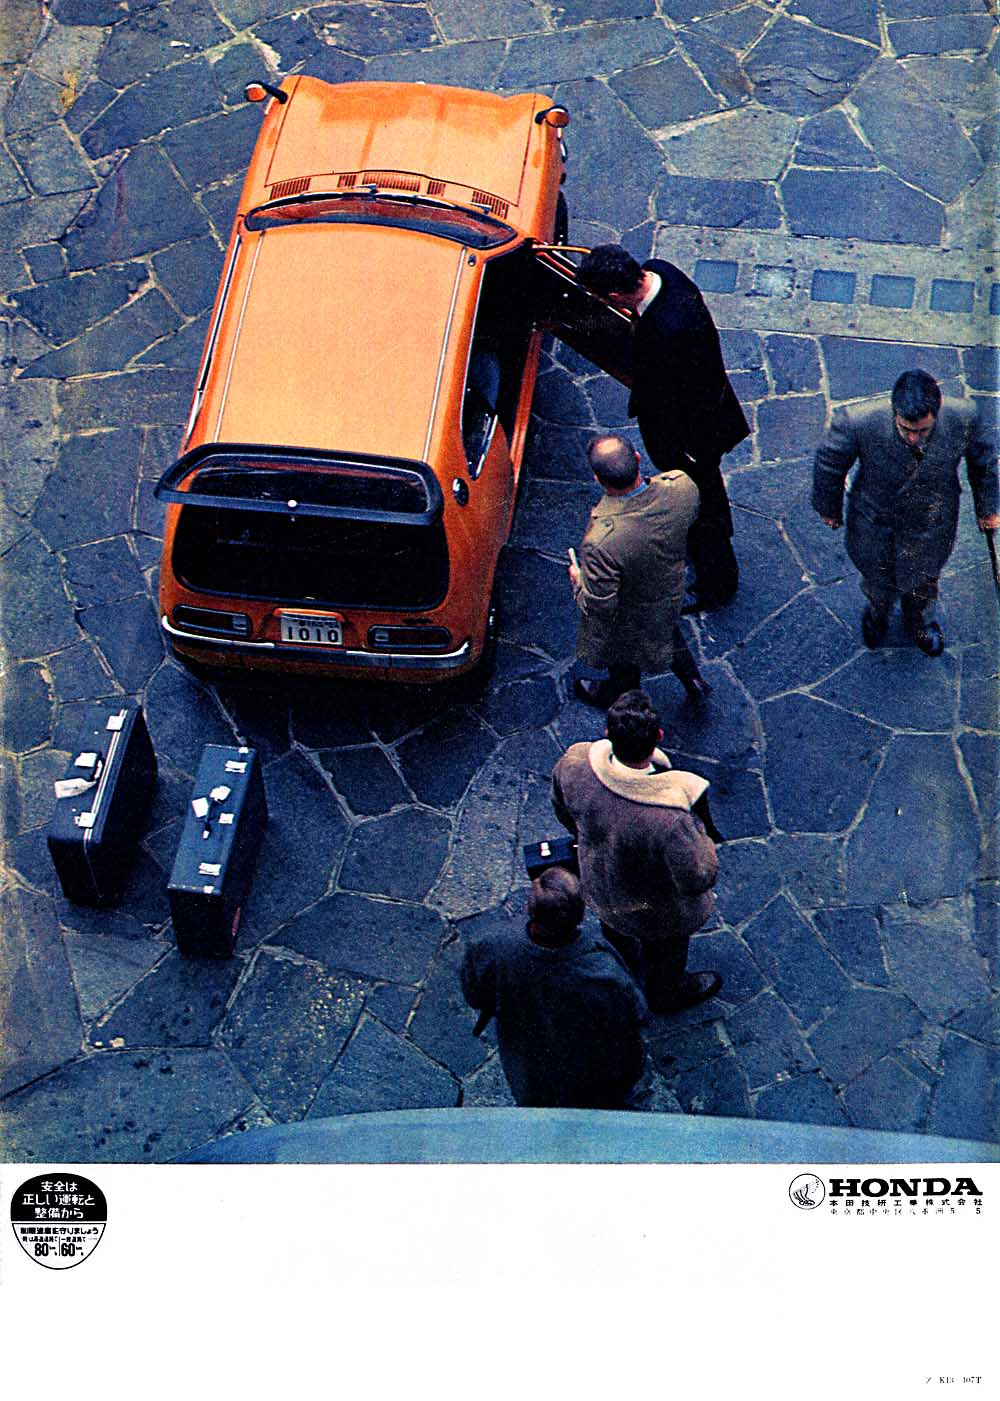 HONDA-Z-world-007.jpg